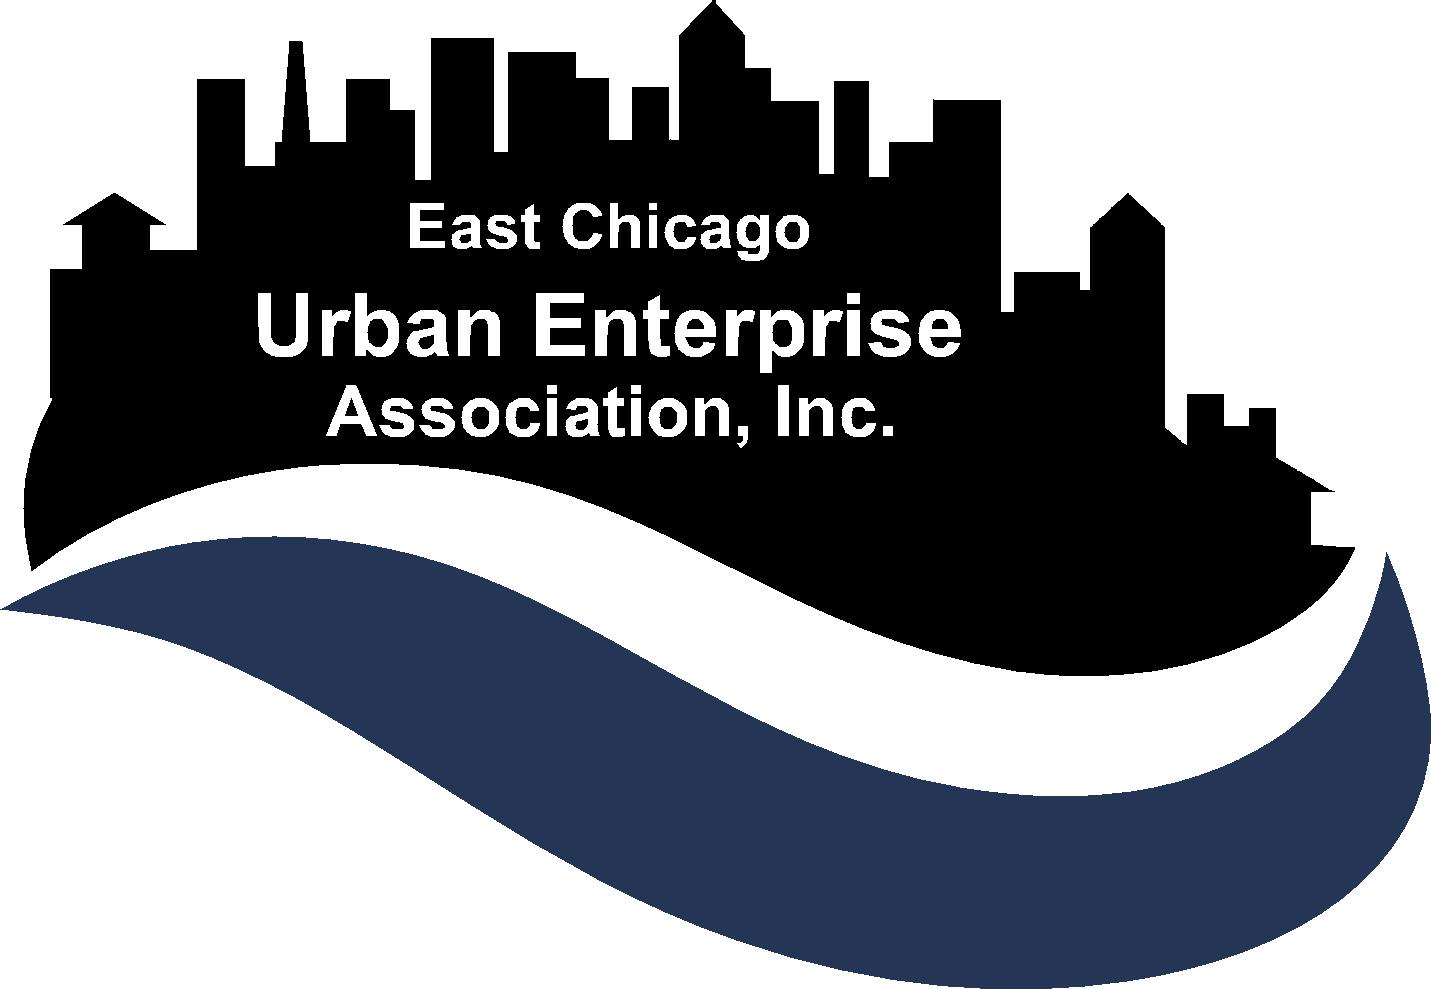 East Chicago Urban Enterprise Association, Inc.